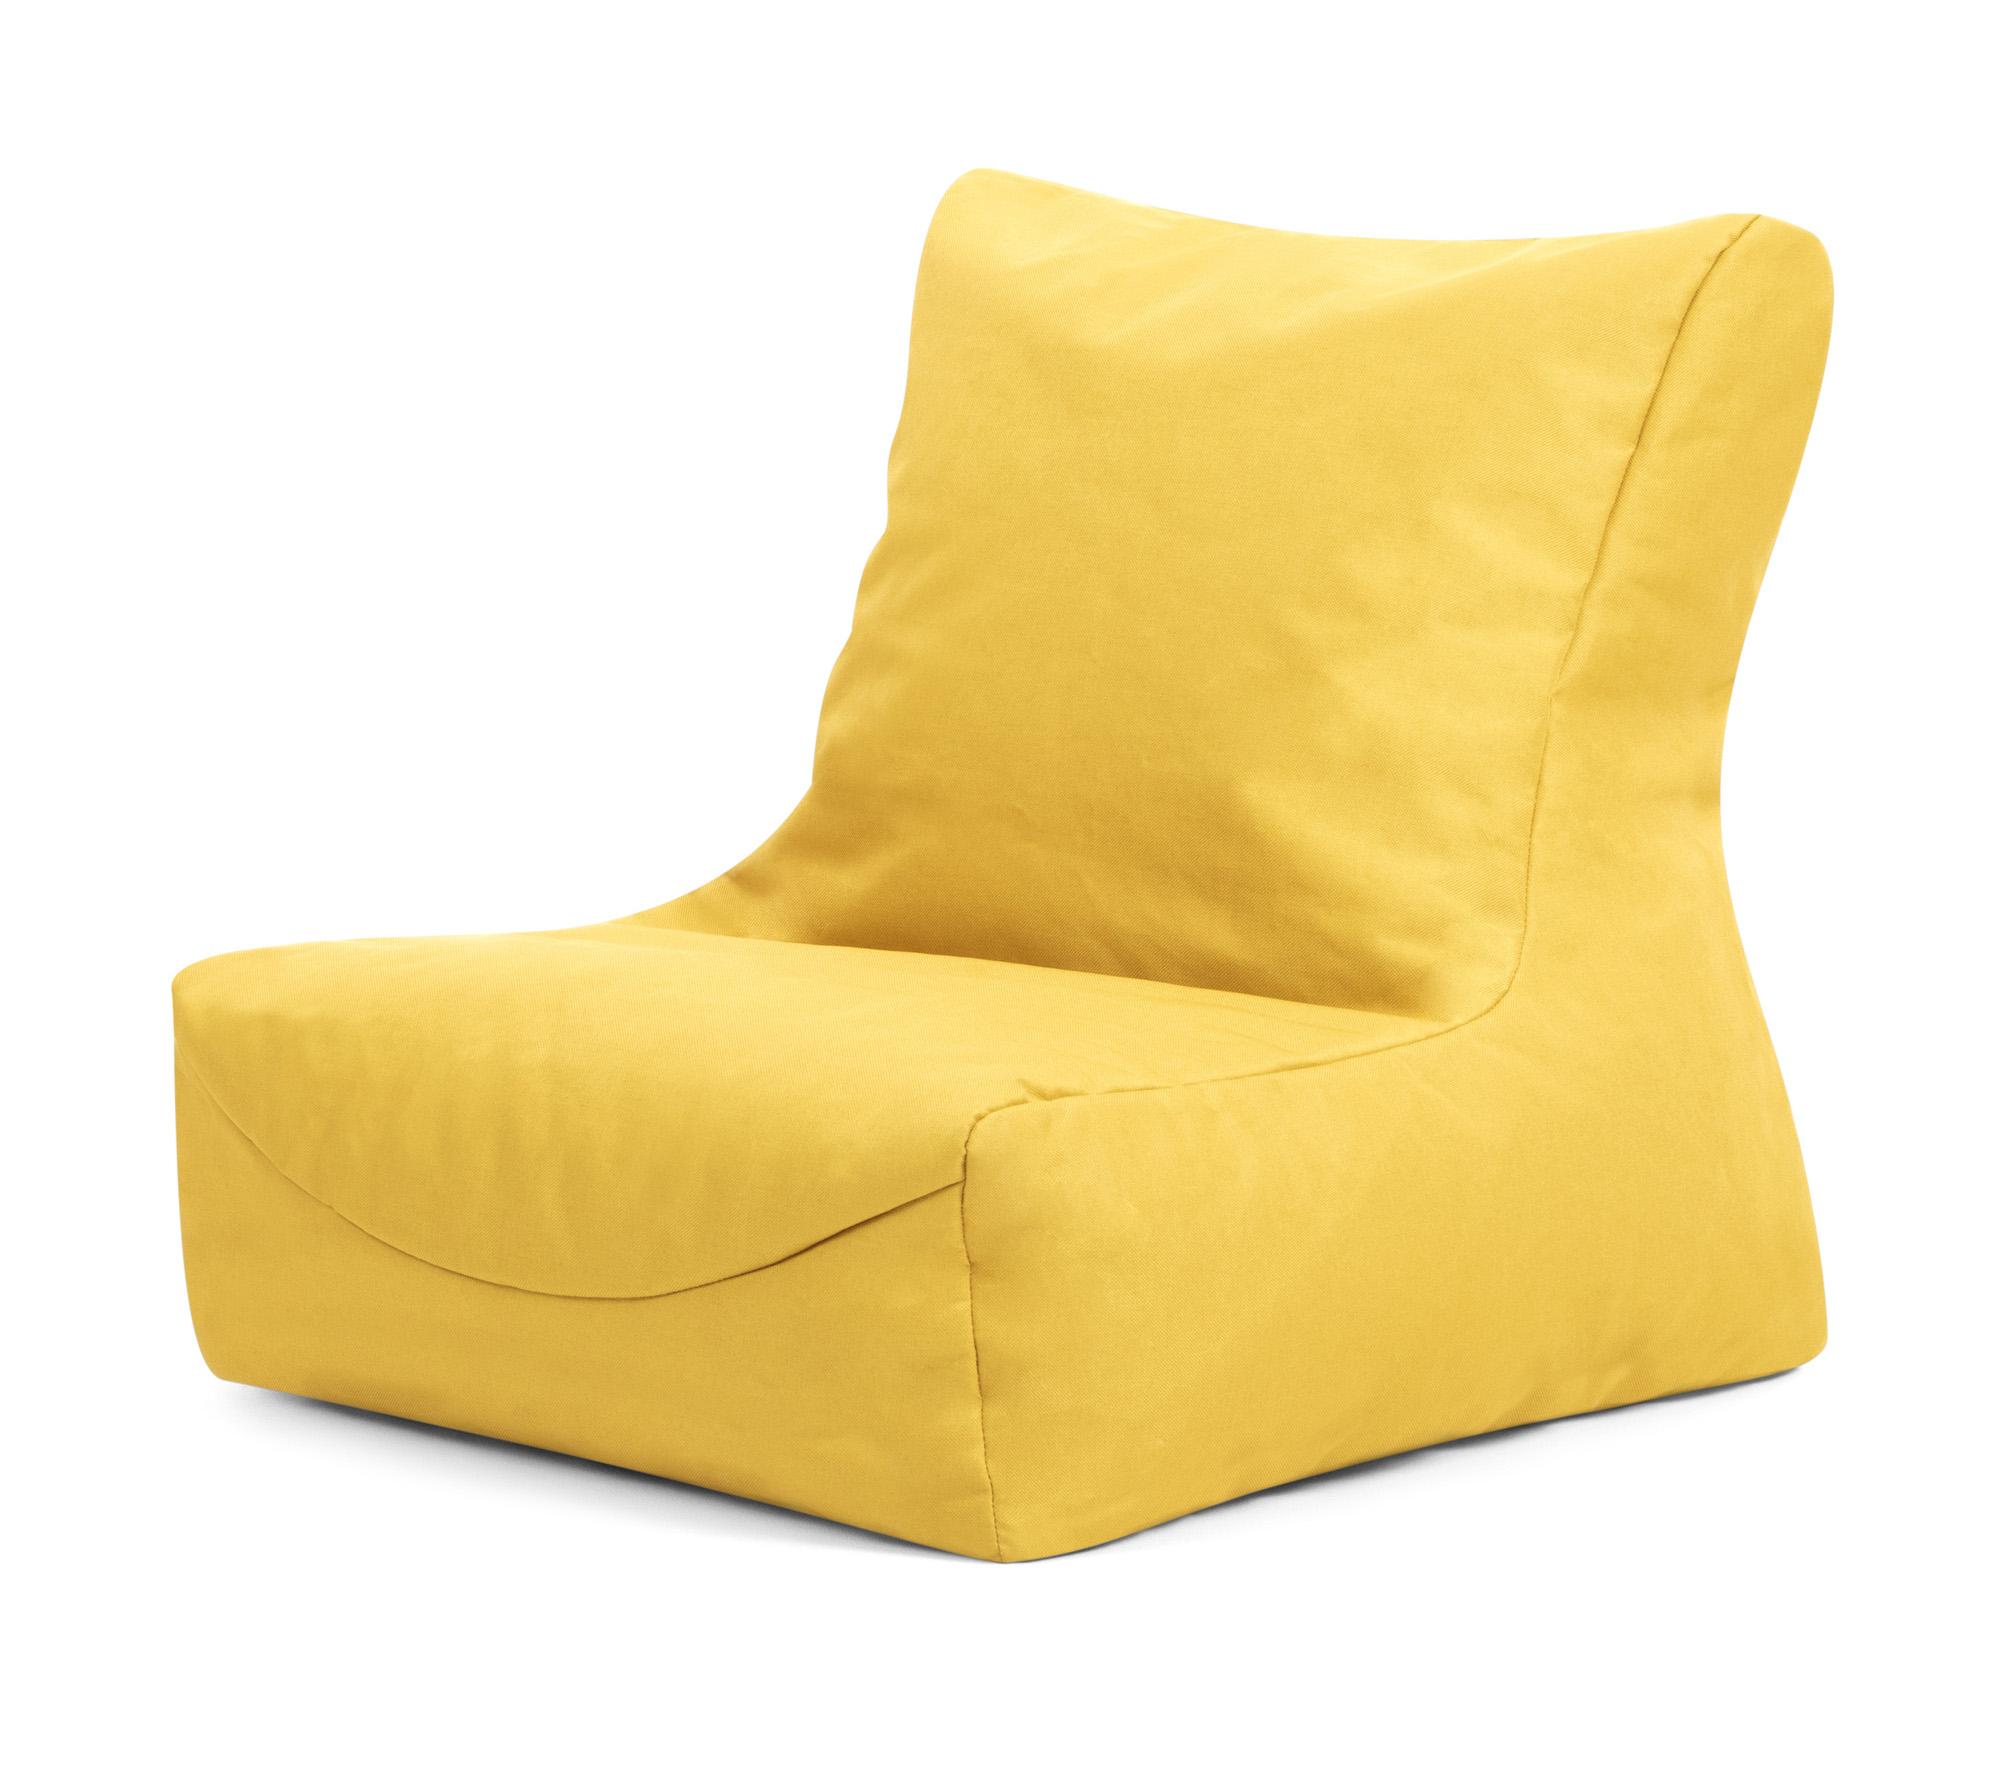 Eden-PRI-Smile-Chair-Mustard-2-300dpi